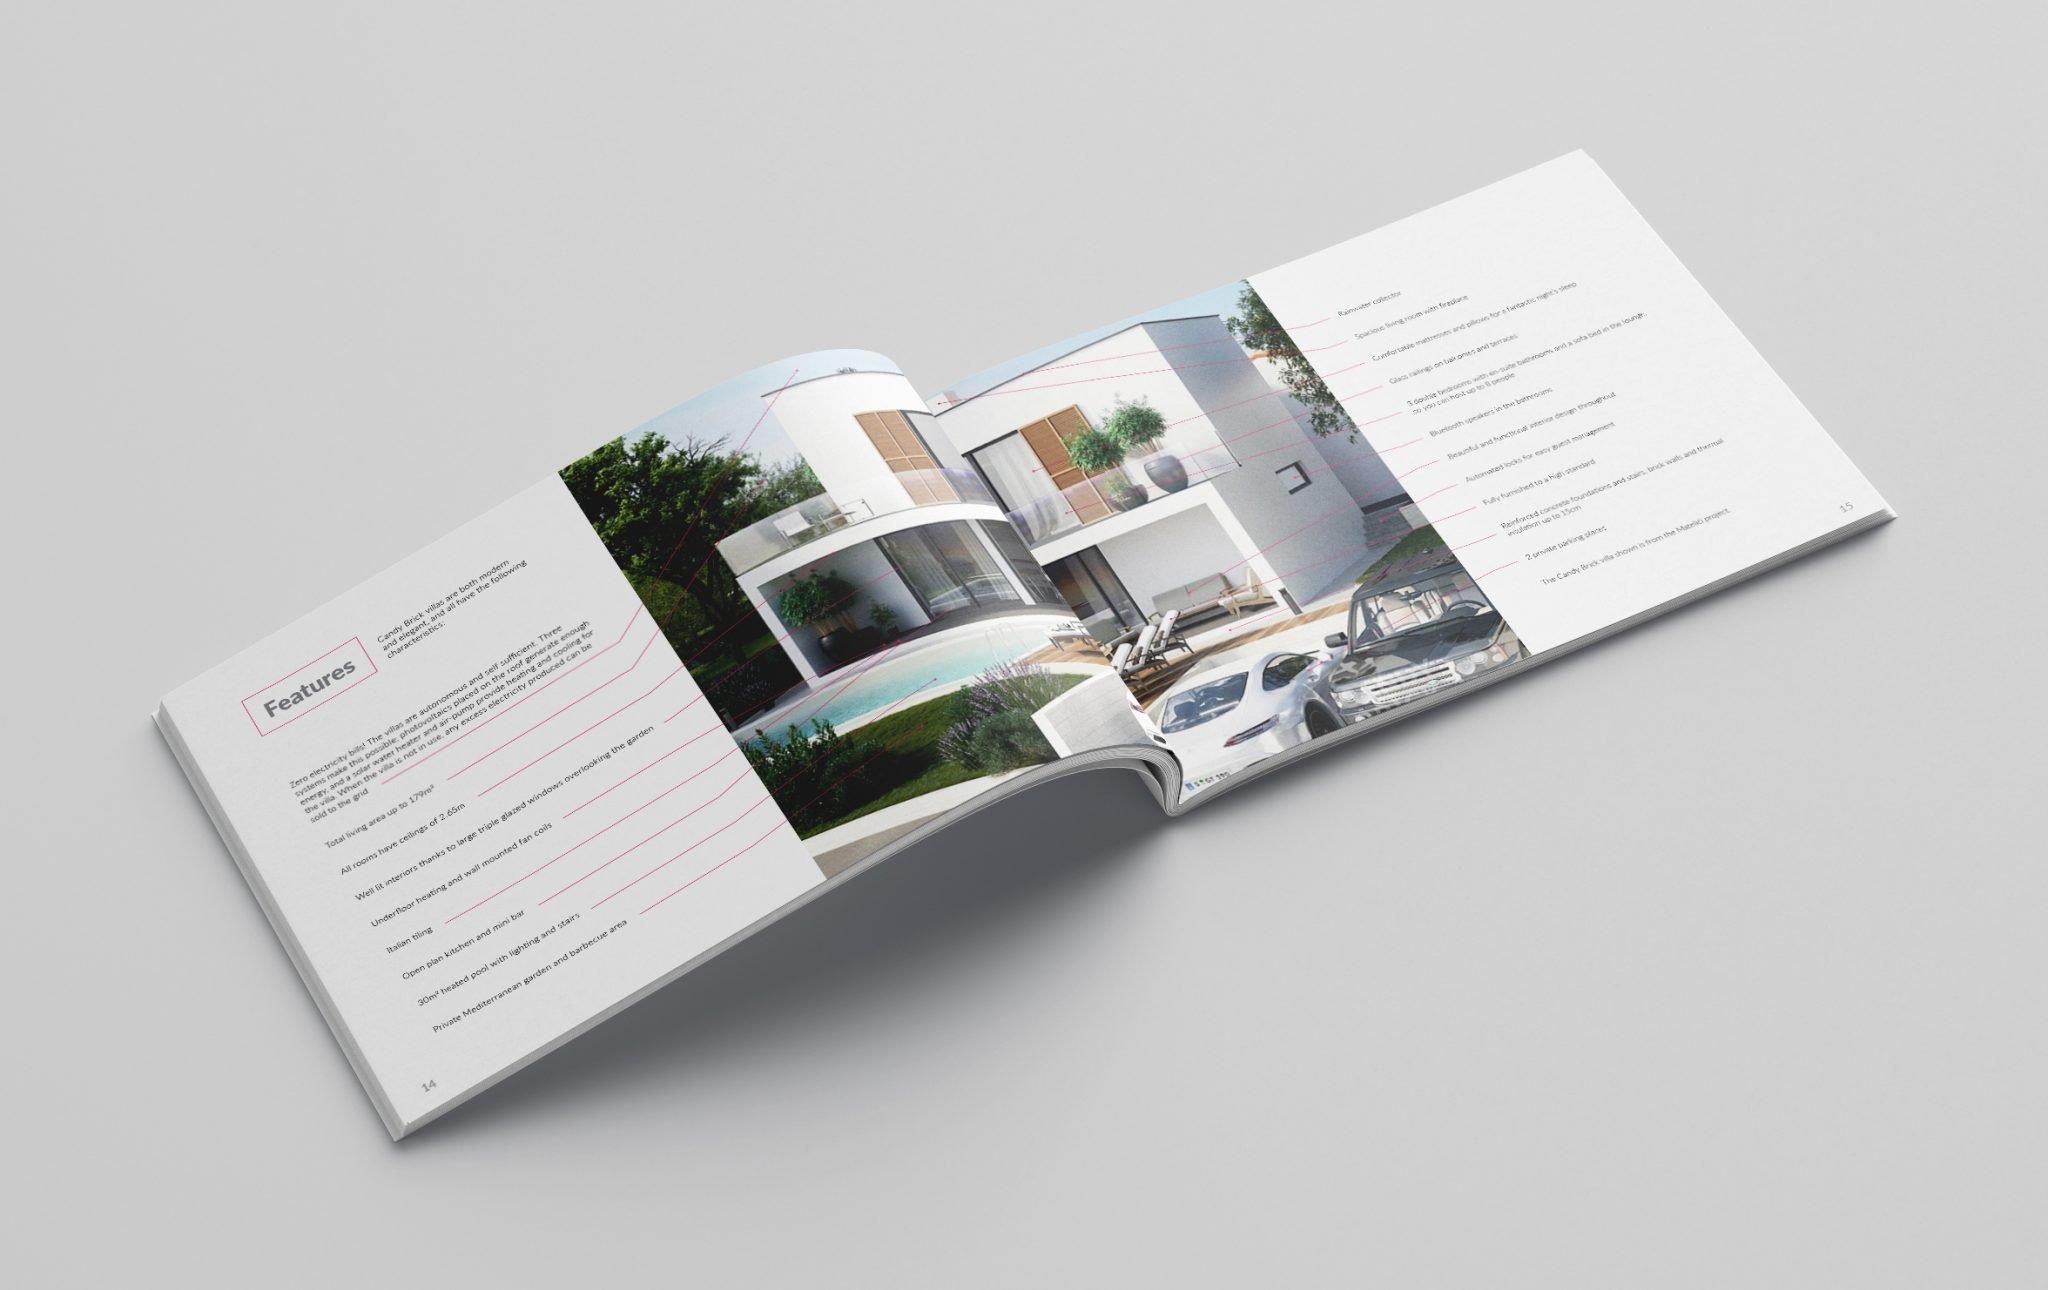 candy-brick-catalogue-design-spread-2